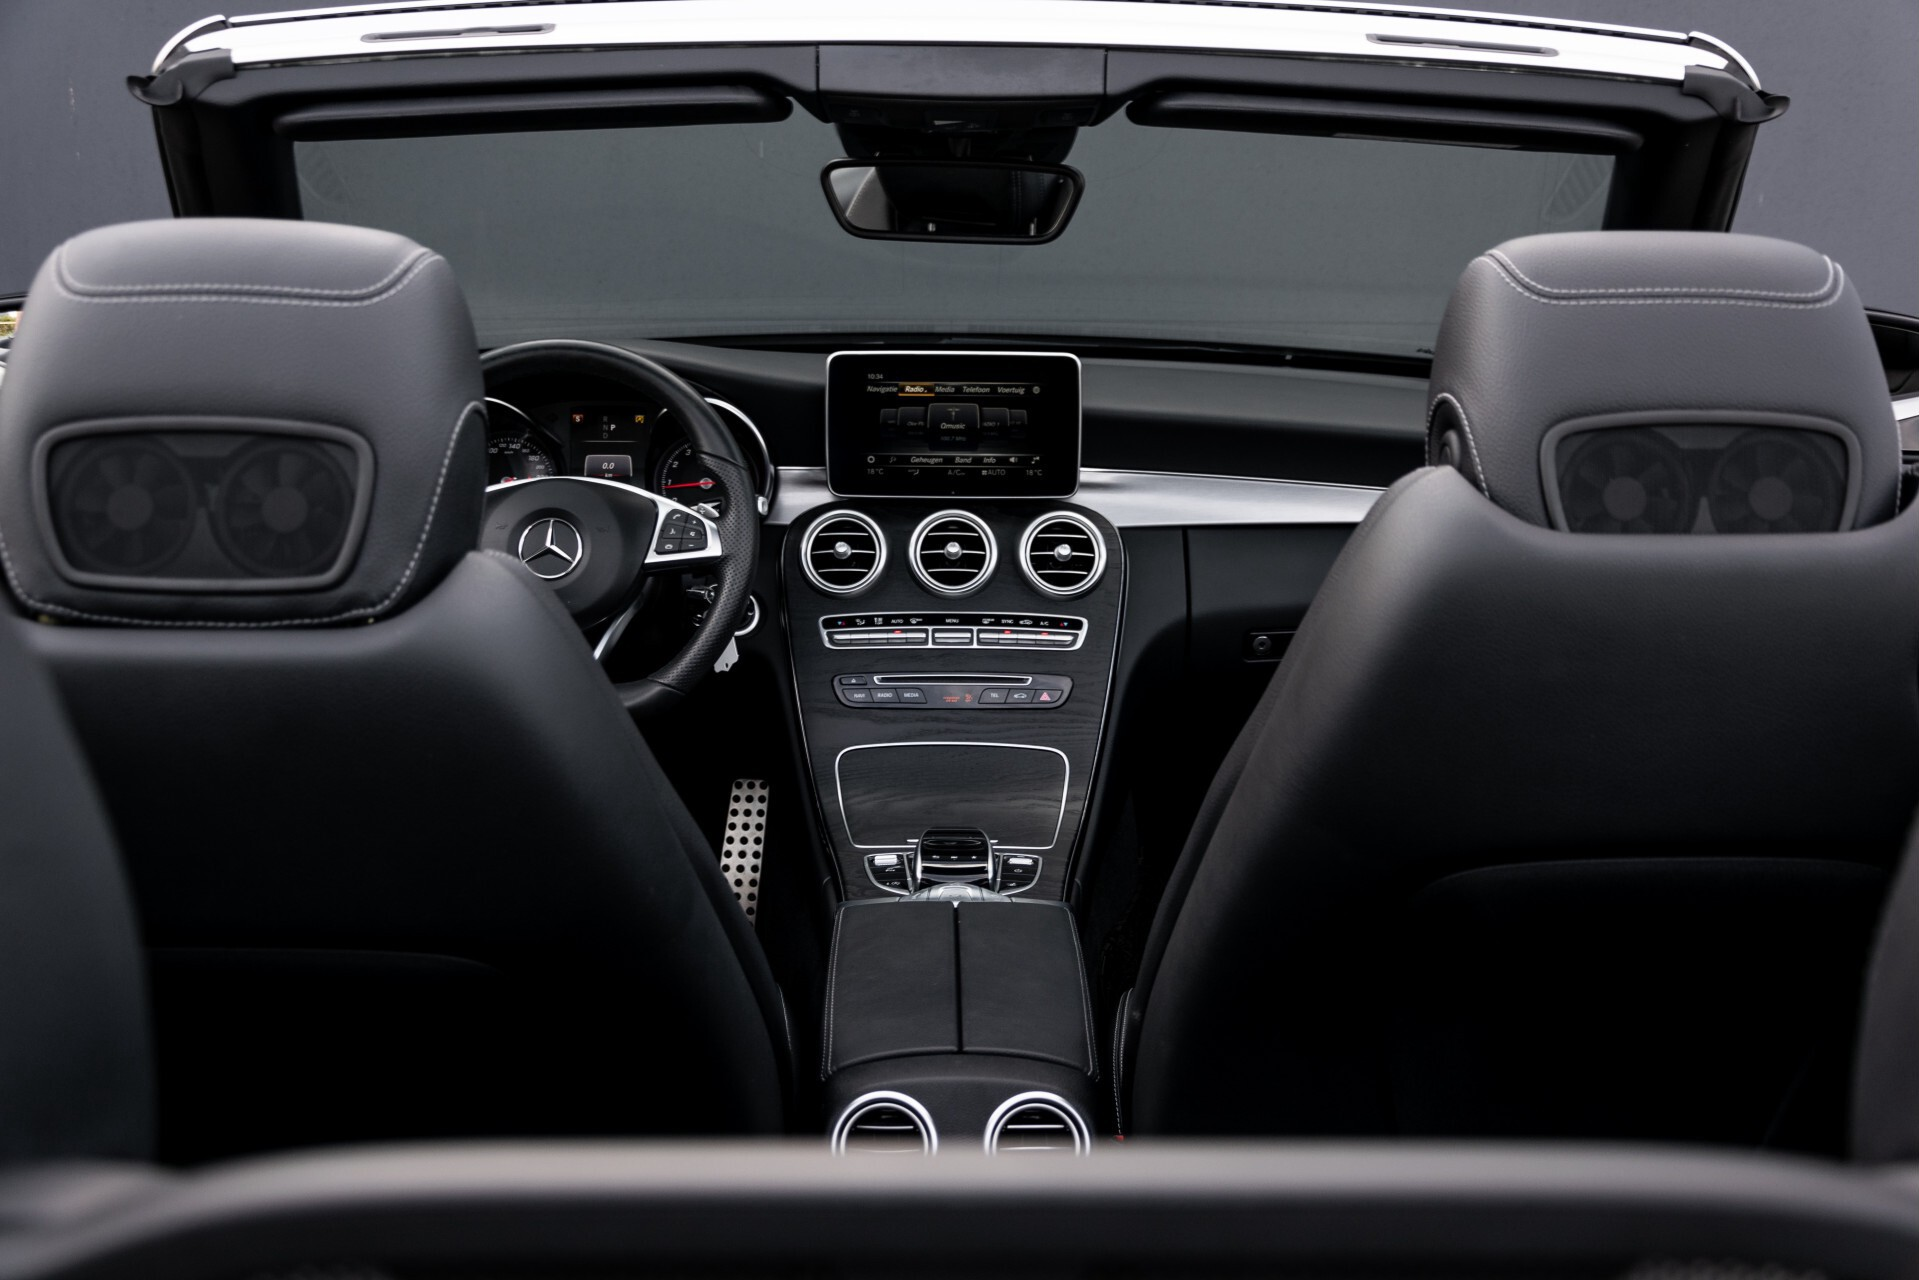 Mercedes-Benz C-Klasse Cabrio 250 AMG Airscarf/Aircap/Comand/ILS/Camera/Rode cabriokap Aut9 Foto 52